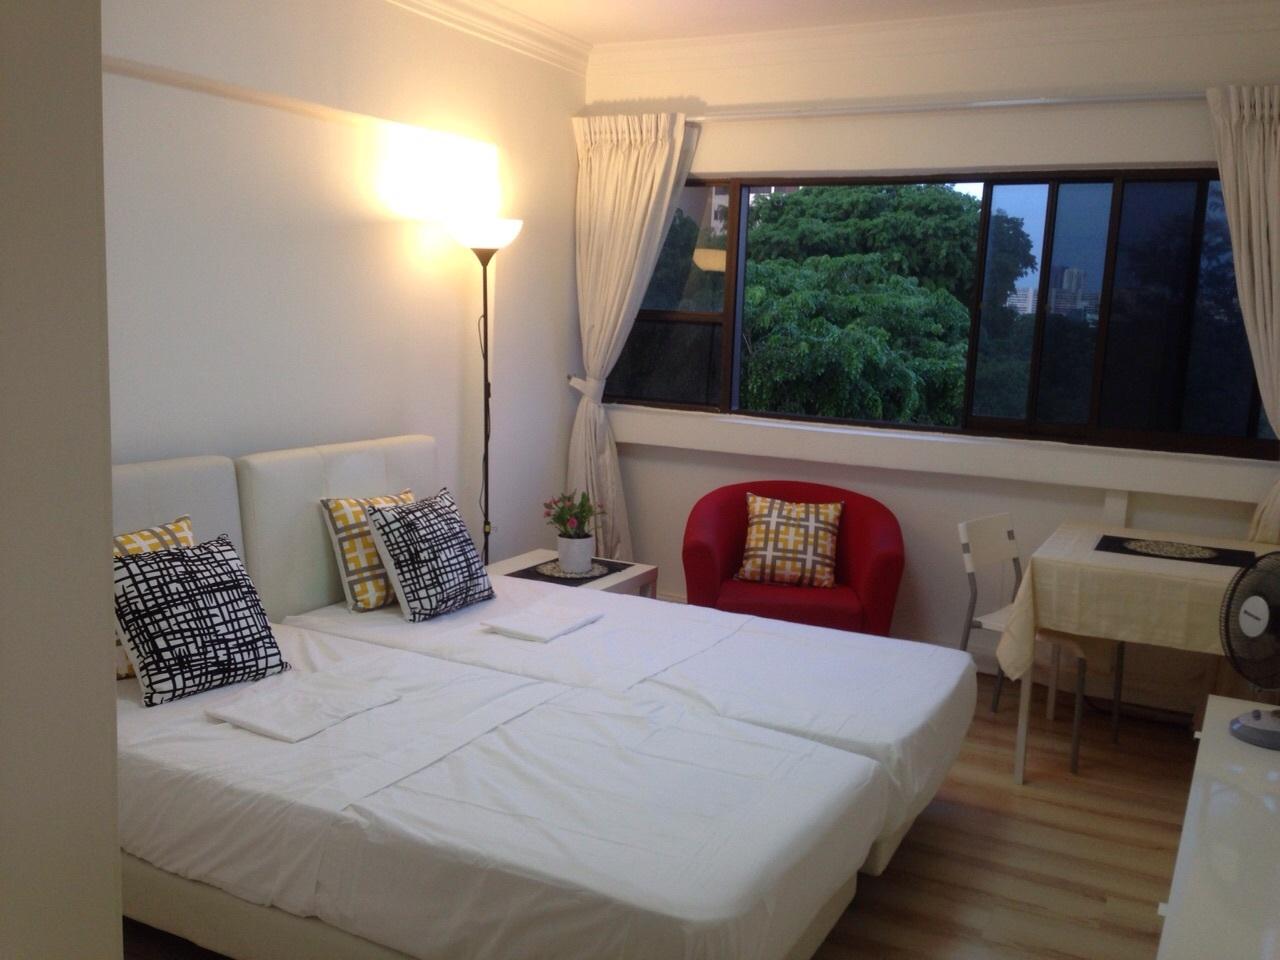 Dunearn Gardens Room For Rent